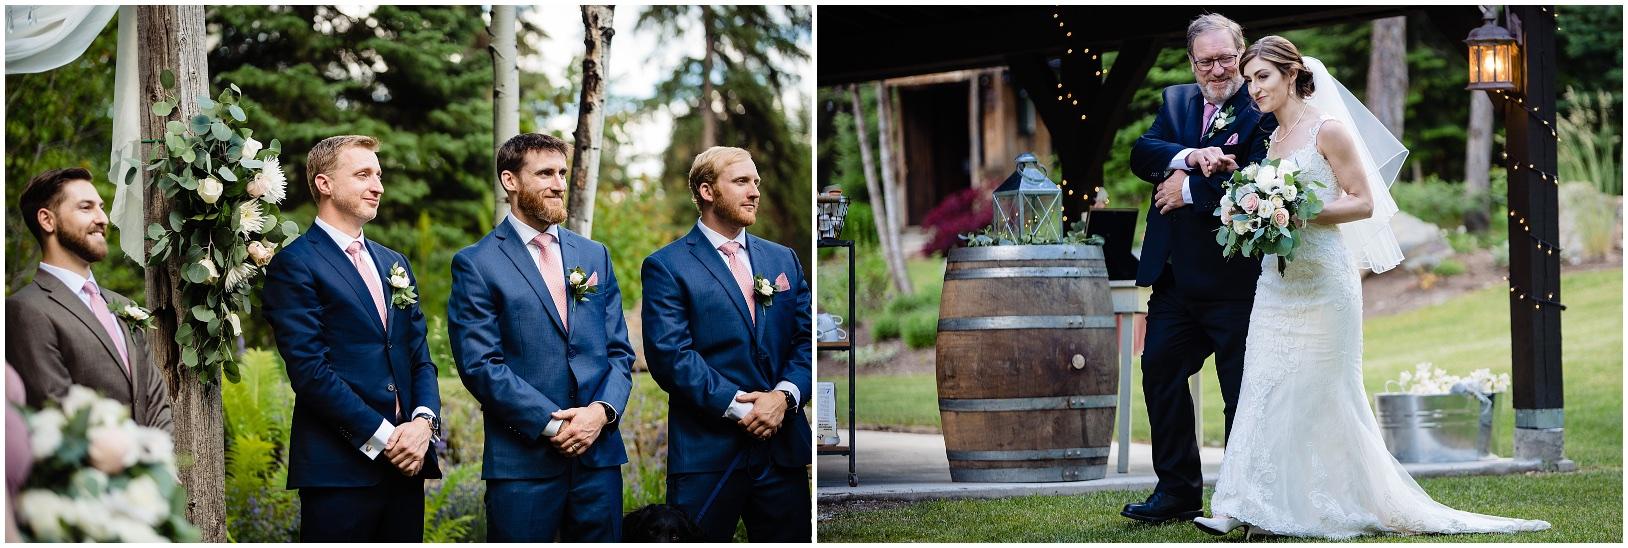 lindseyjanephoto_wedding0055.jpg